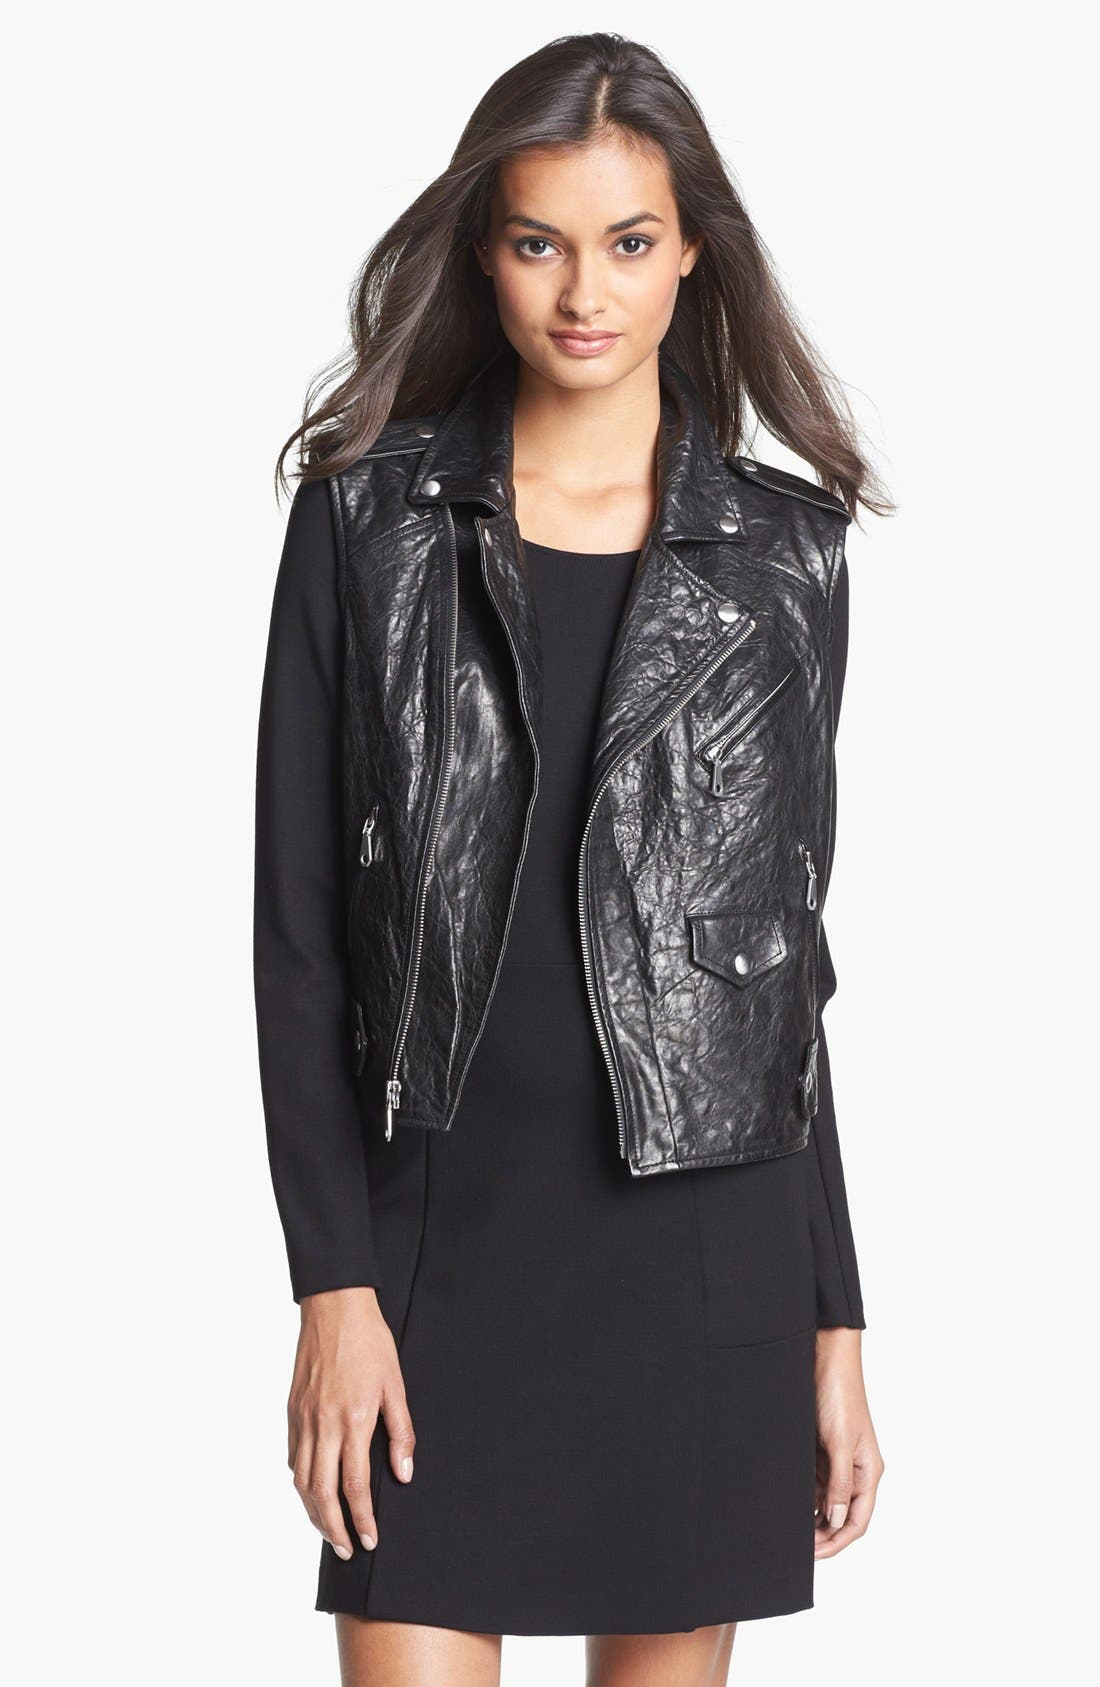 Alternate Image 1 Selected - Rebecca Minkoff 'Leandra' Leather Vest